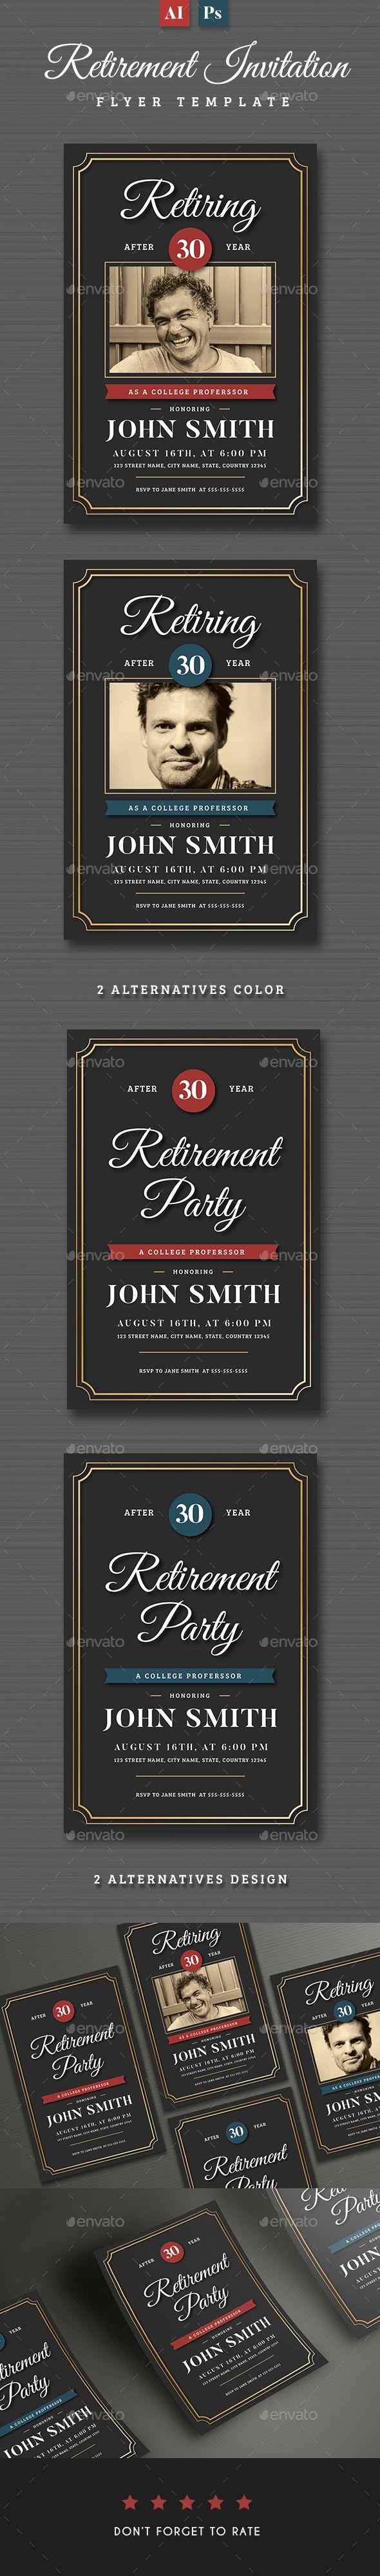 #Retirement #Invitation Flyer Templates - Invitations #Cards & Invites